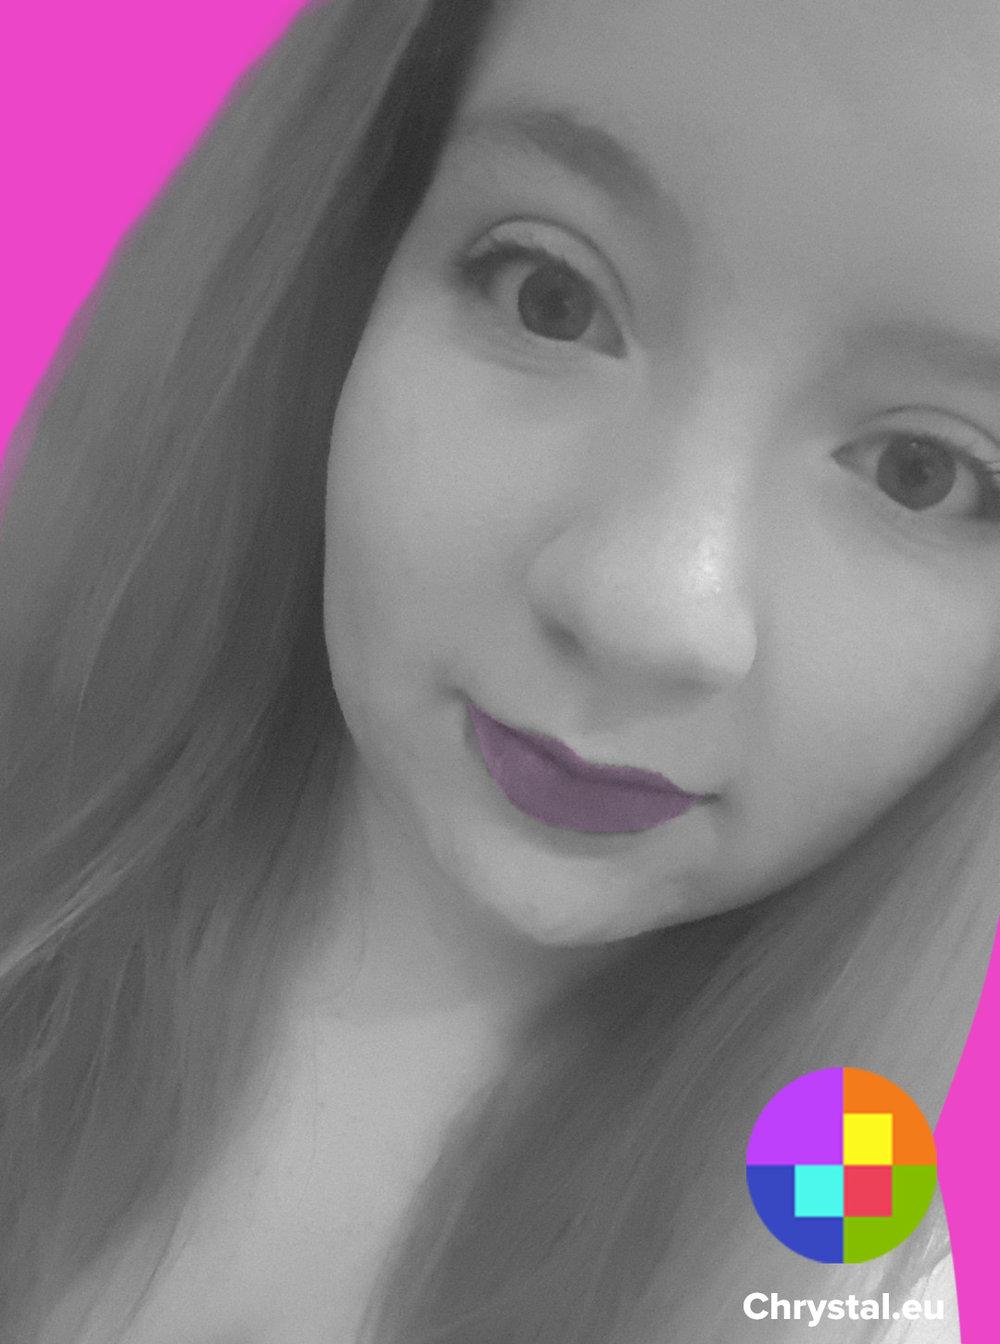 Music   Natasha Franklin  Young Music journalist based in Glasgow. She loves music, film and the arts.     Twitter:  @Tasha132       Instagram:  @Tasha   Facebook:  @Tasha